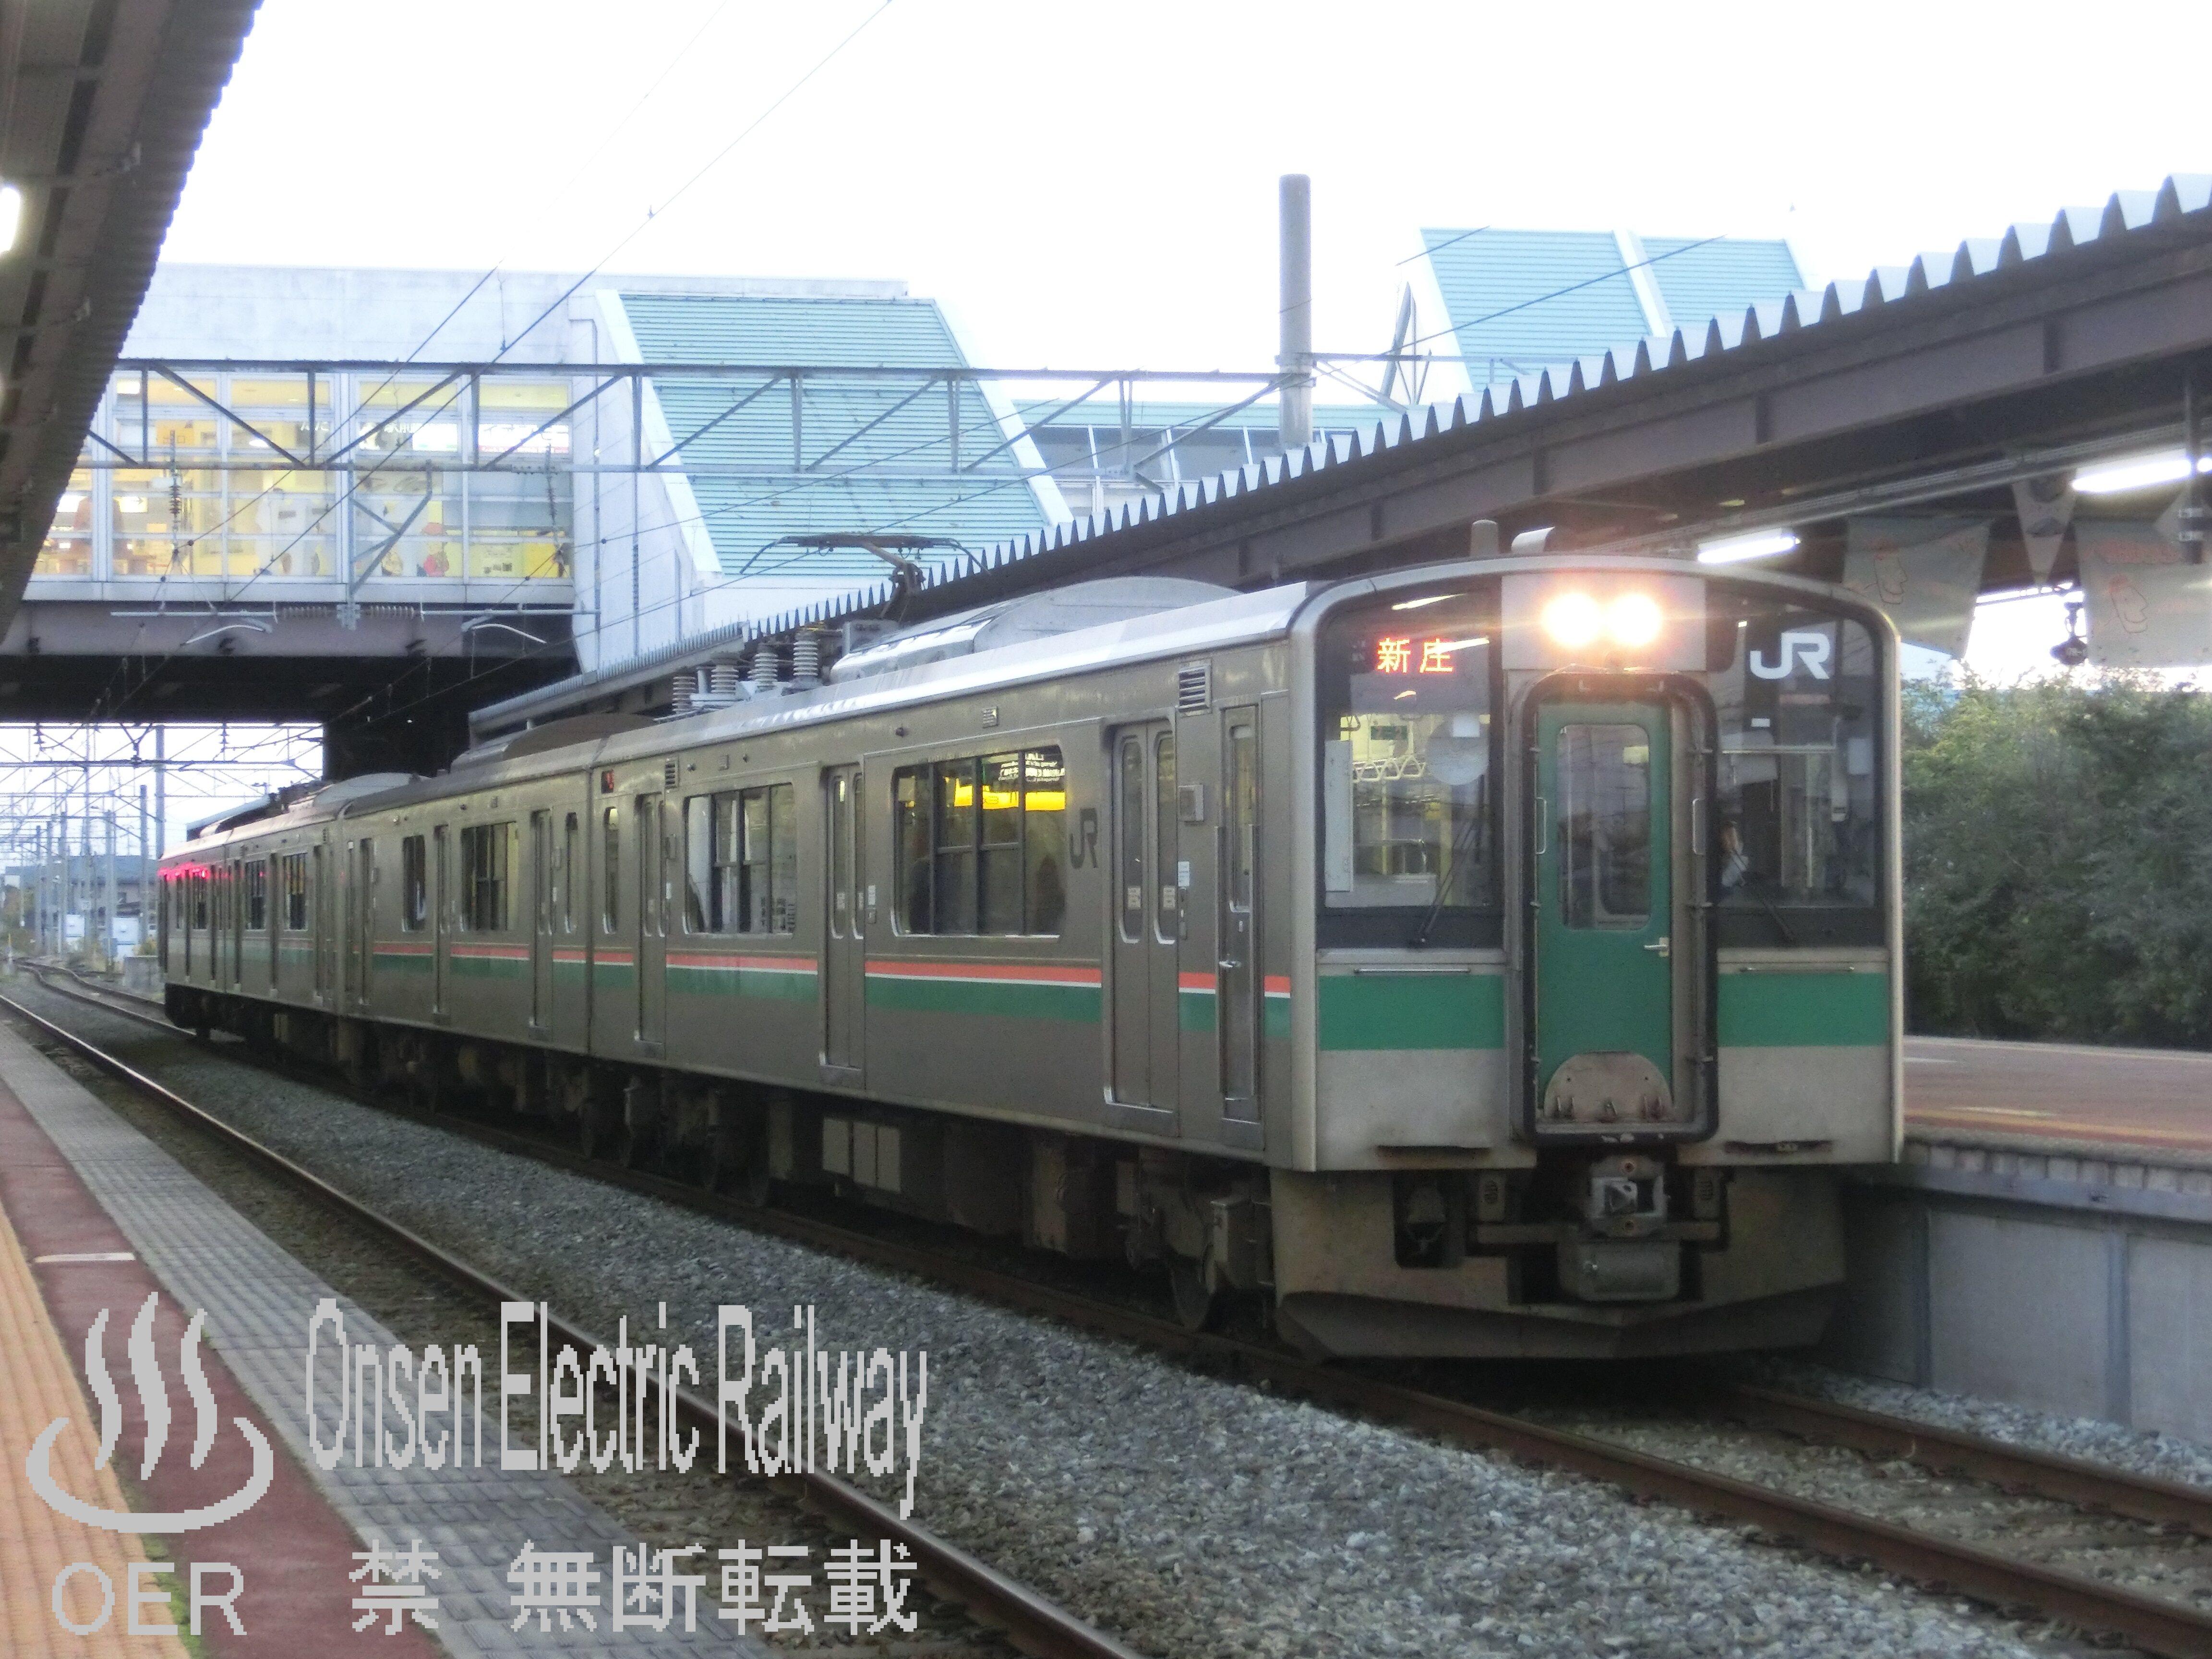 02_jr_701-5500_01.jpg